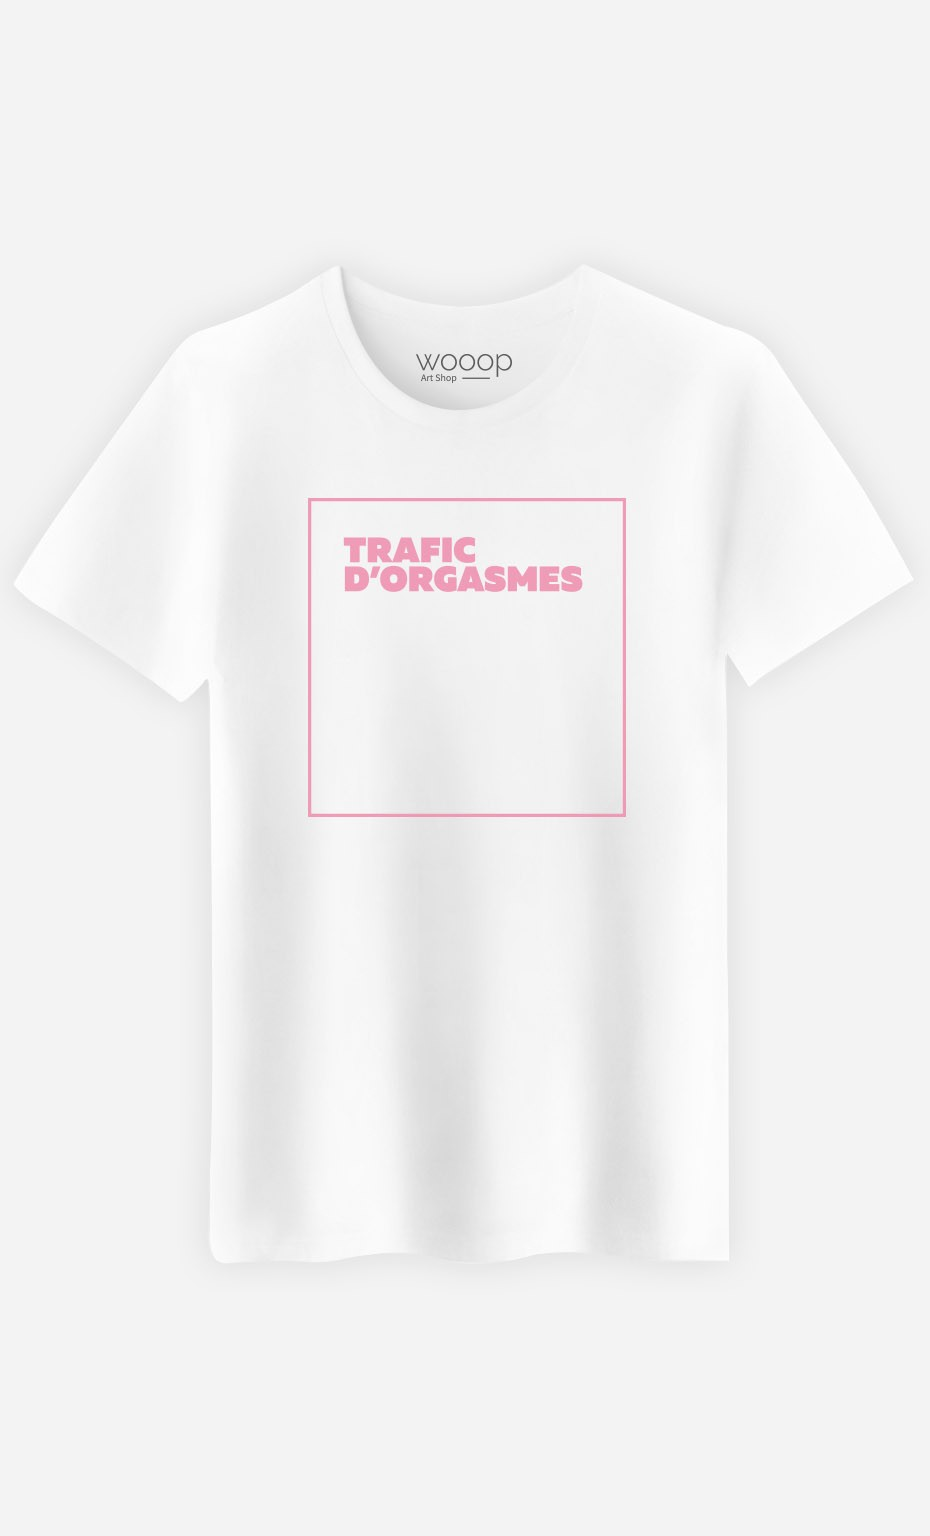 T-Shirt Trafic D'Orgasmes